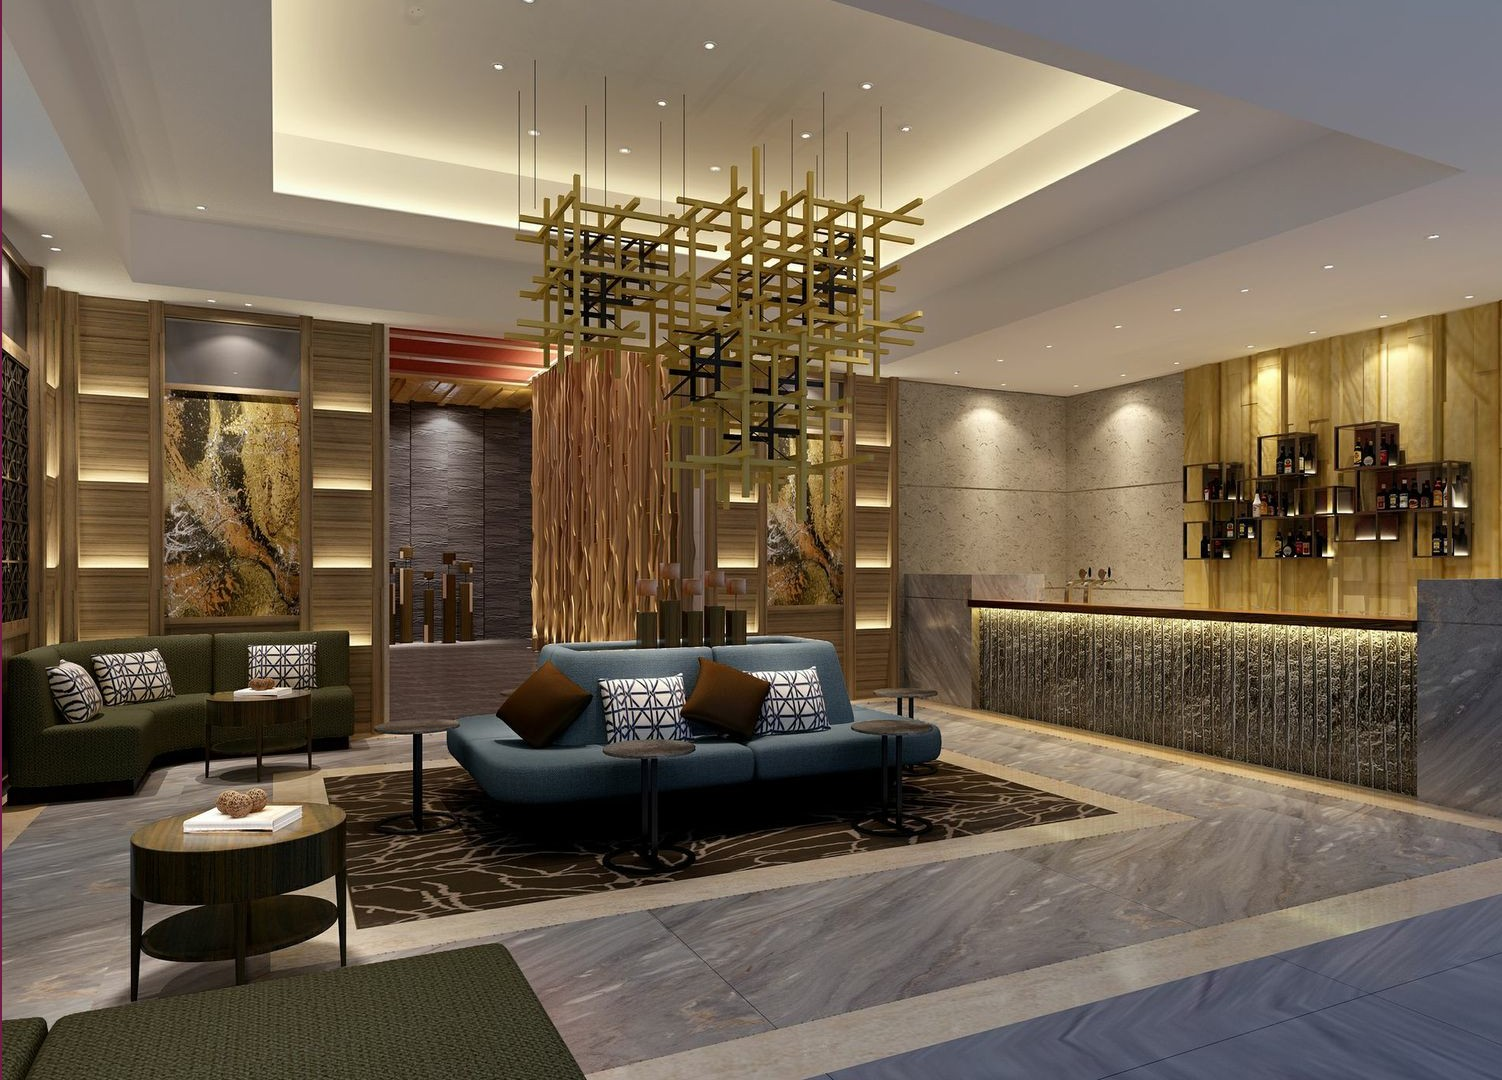 Plaza Premium Impress At Heathrow\u0027s Terminal 2 | TheDesignAir